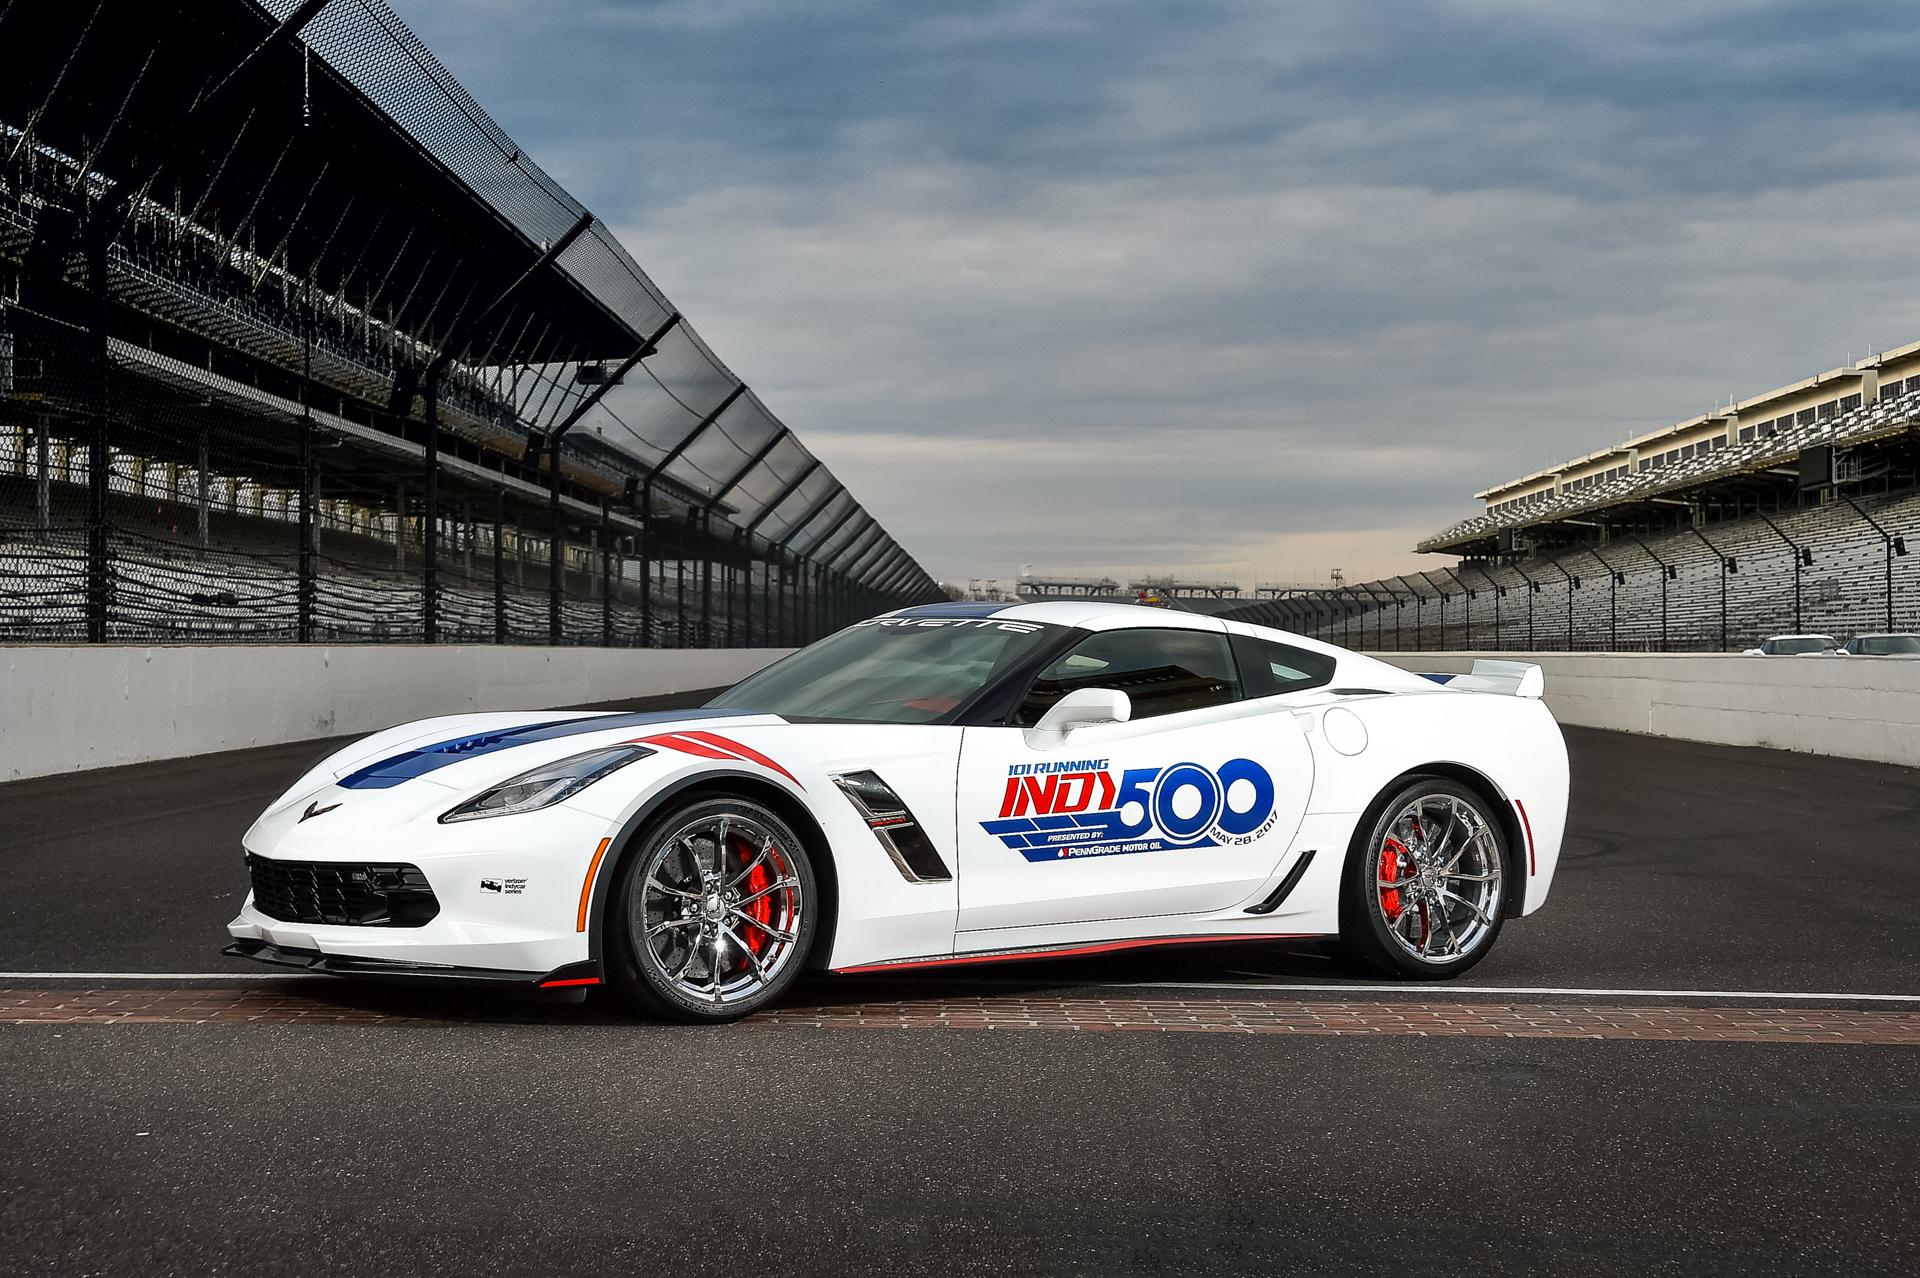 2017 Chevrolet Corvette Grand Sport will pace Indy 500 field